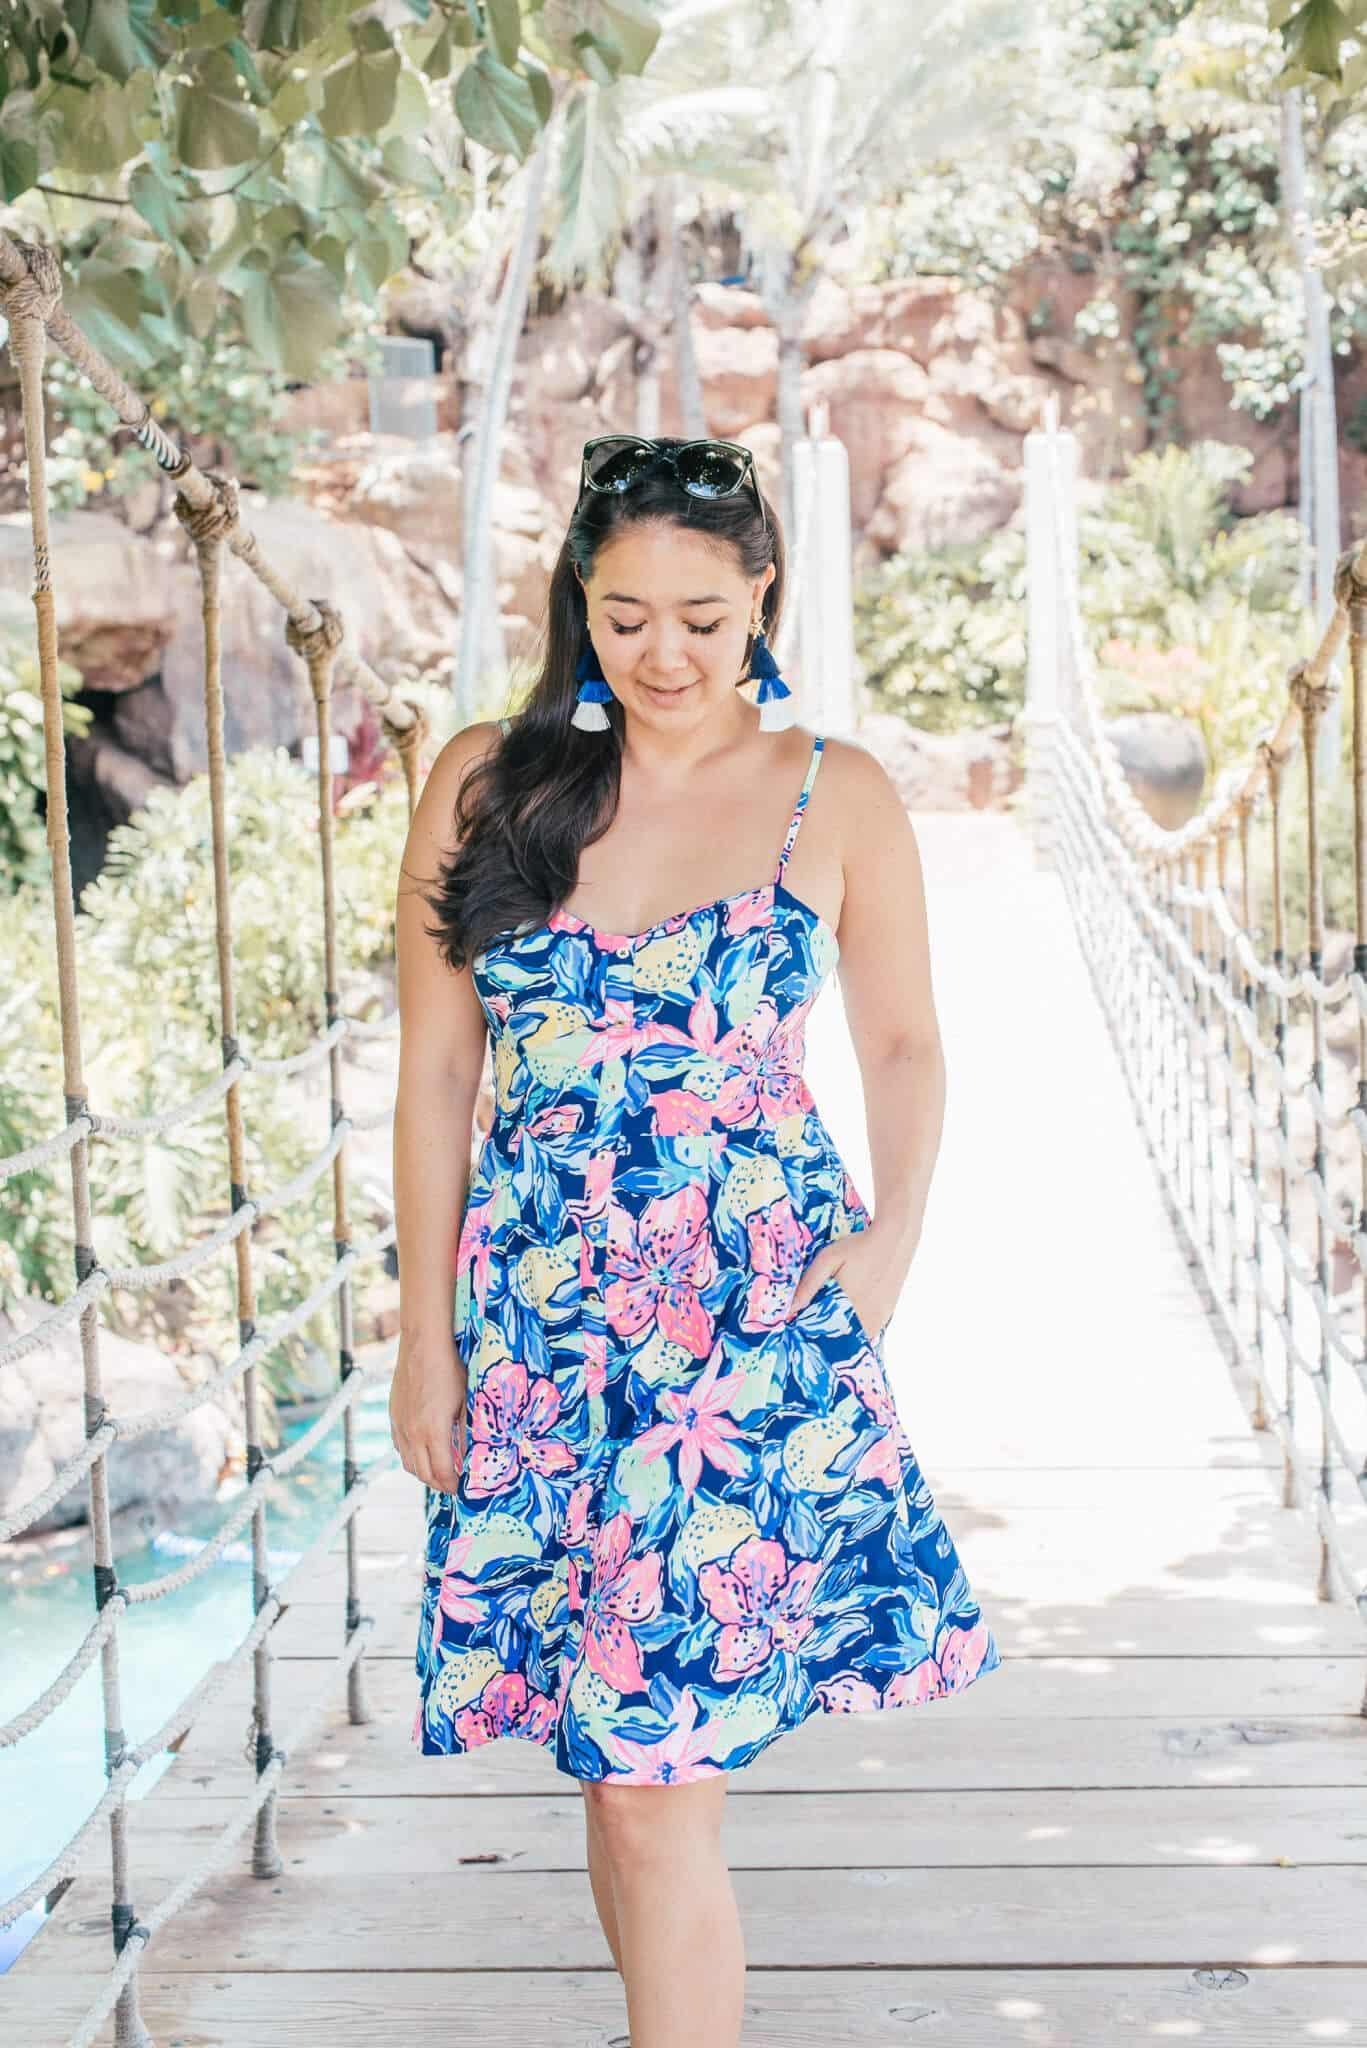 Lilly Pulitzer Dress featured by popular San Francisco fashion blogger WTFab